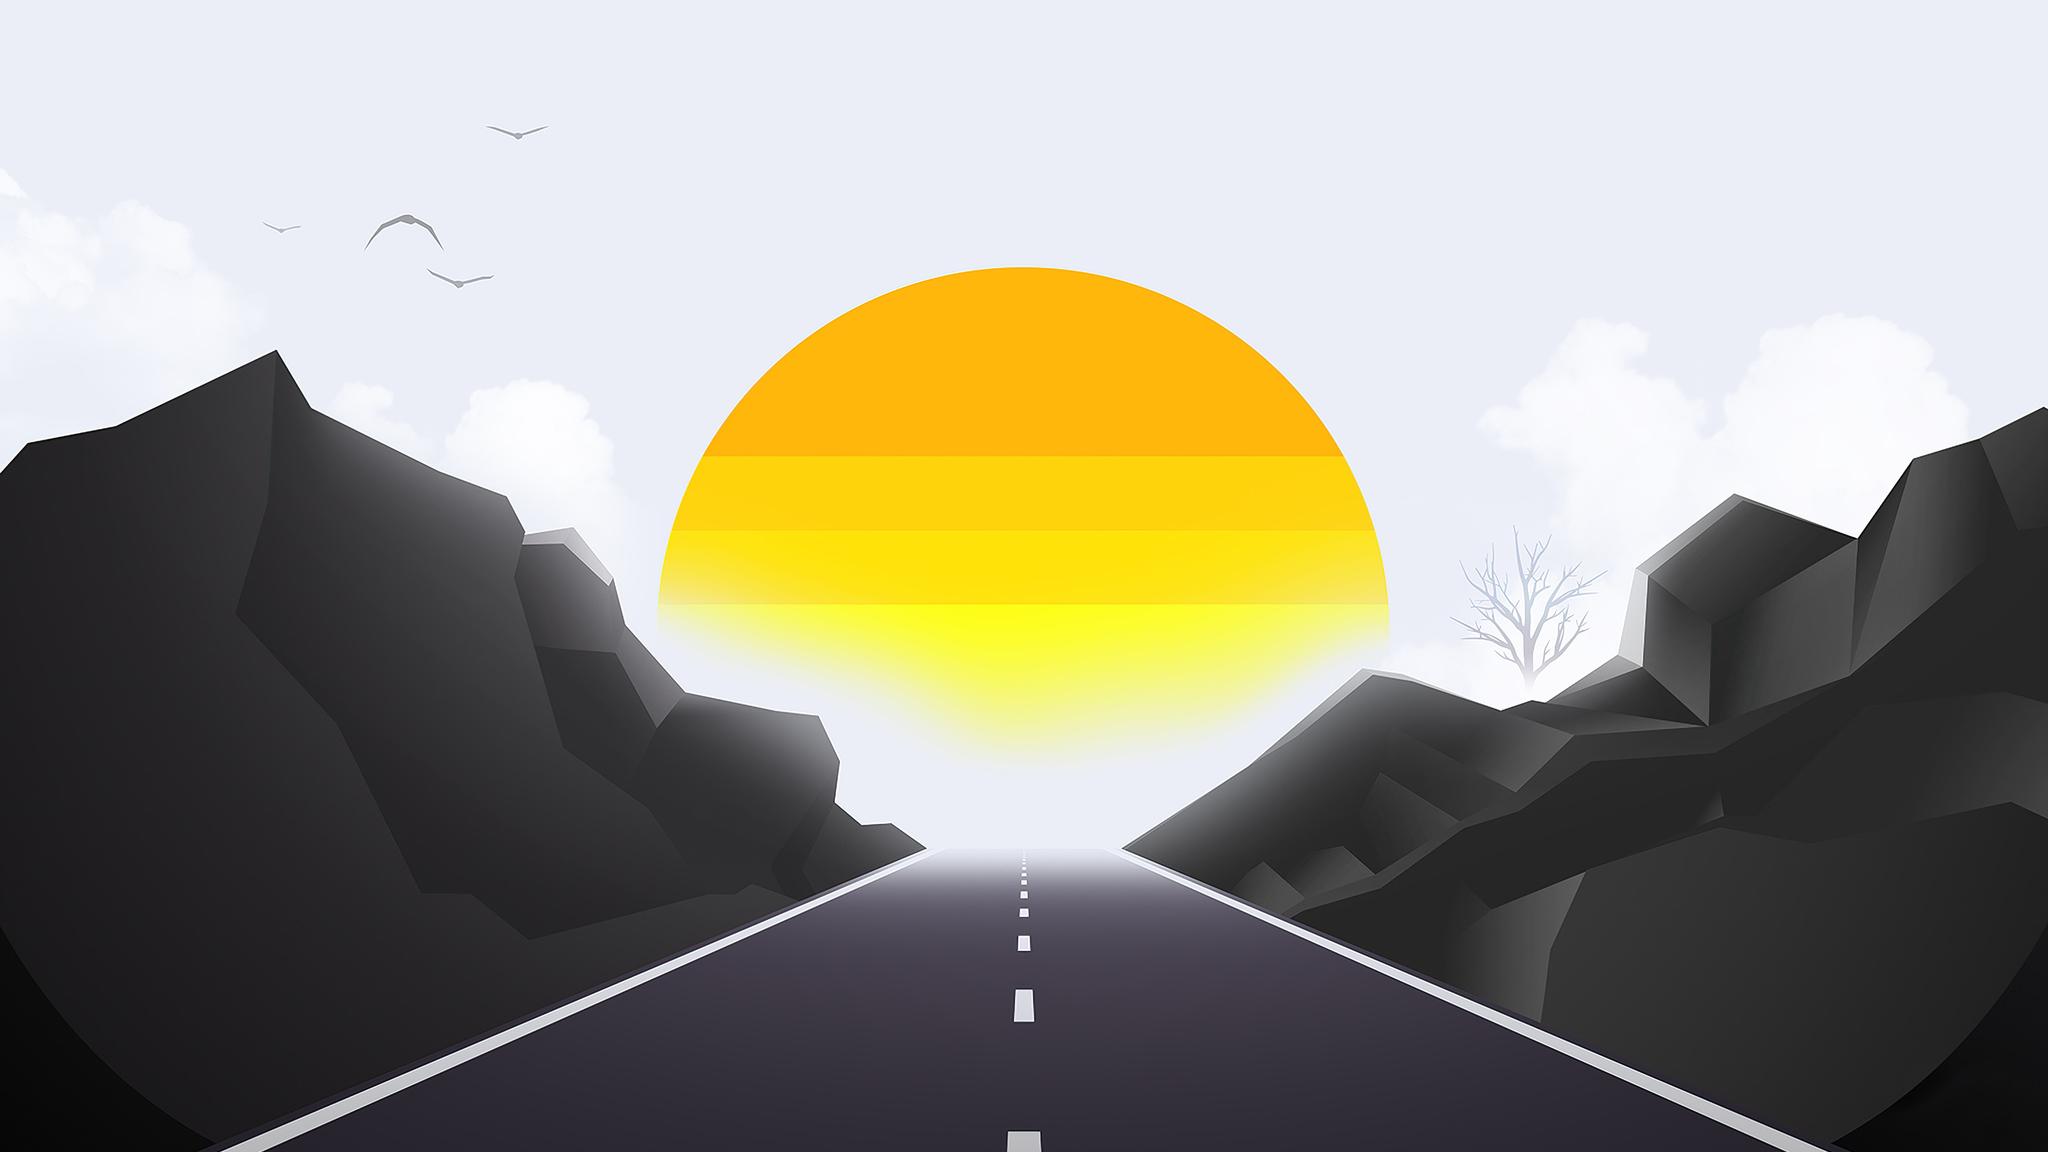 road-mist-sun-landscape-minimal-4k-3y.jpg